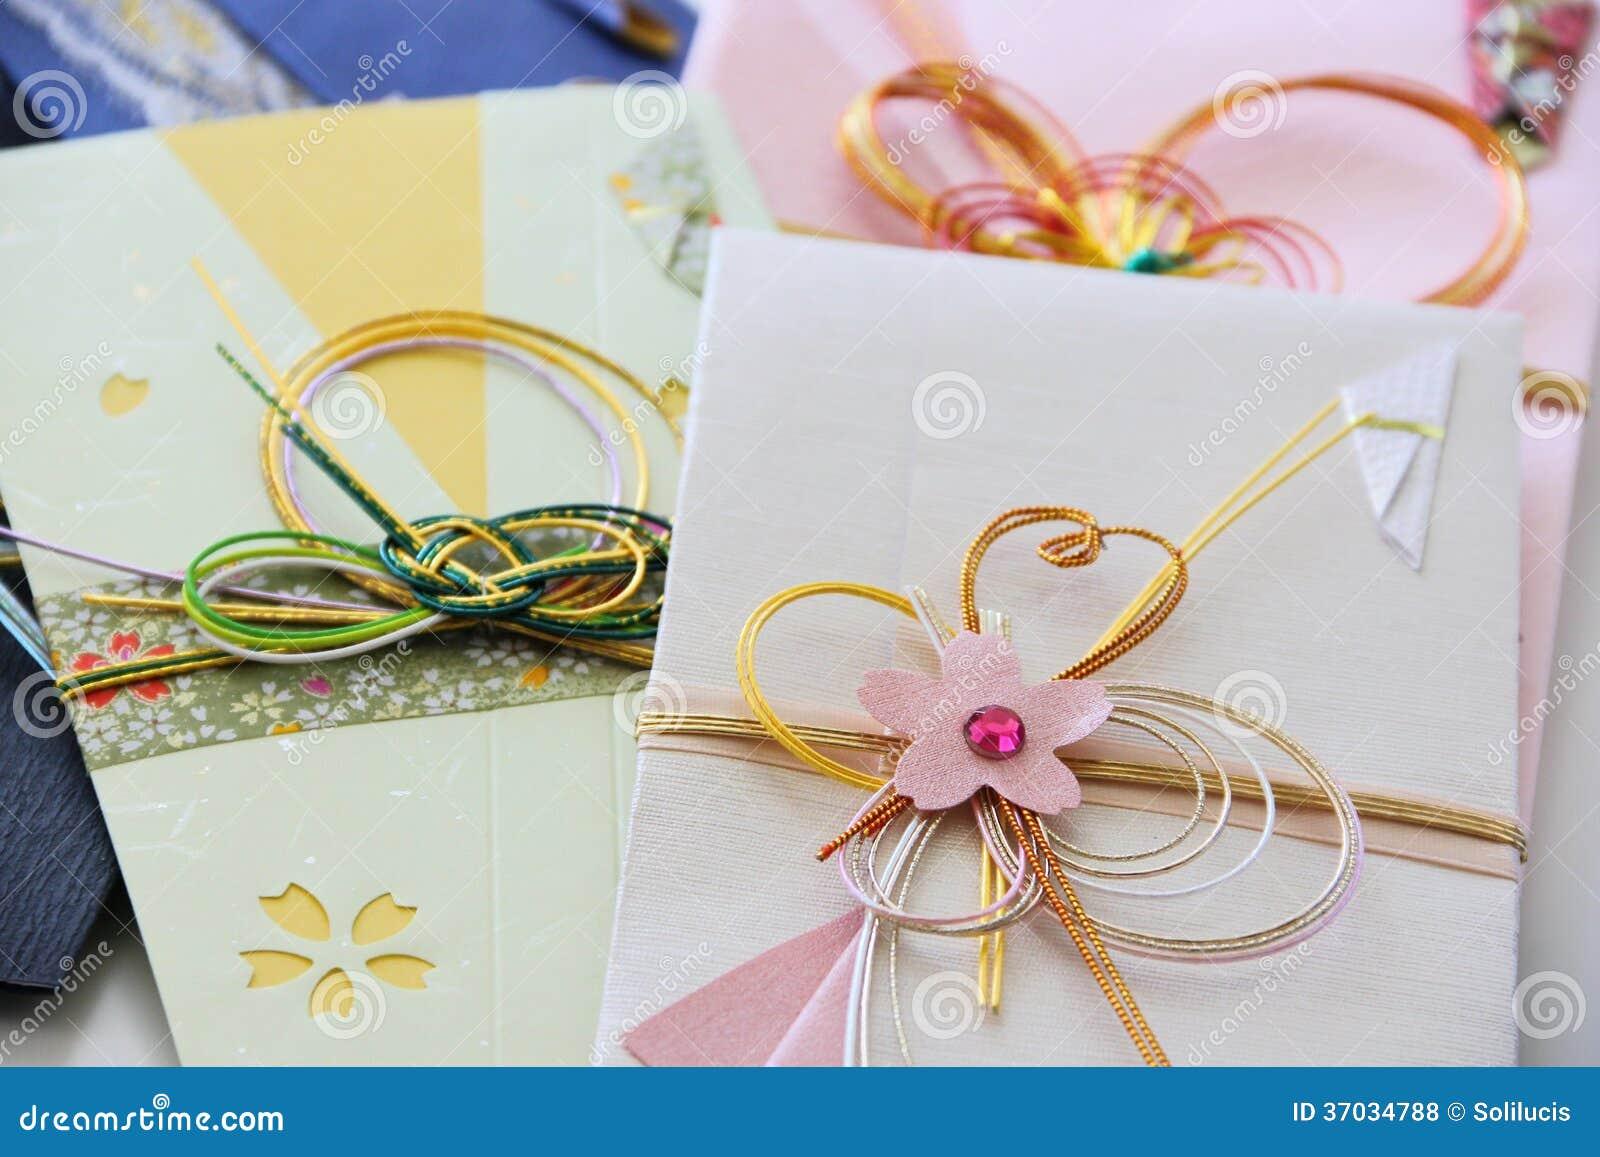 Sampling Of Japanese Money Envelopes Stock Photo - Image of present ...